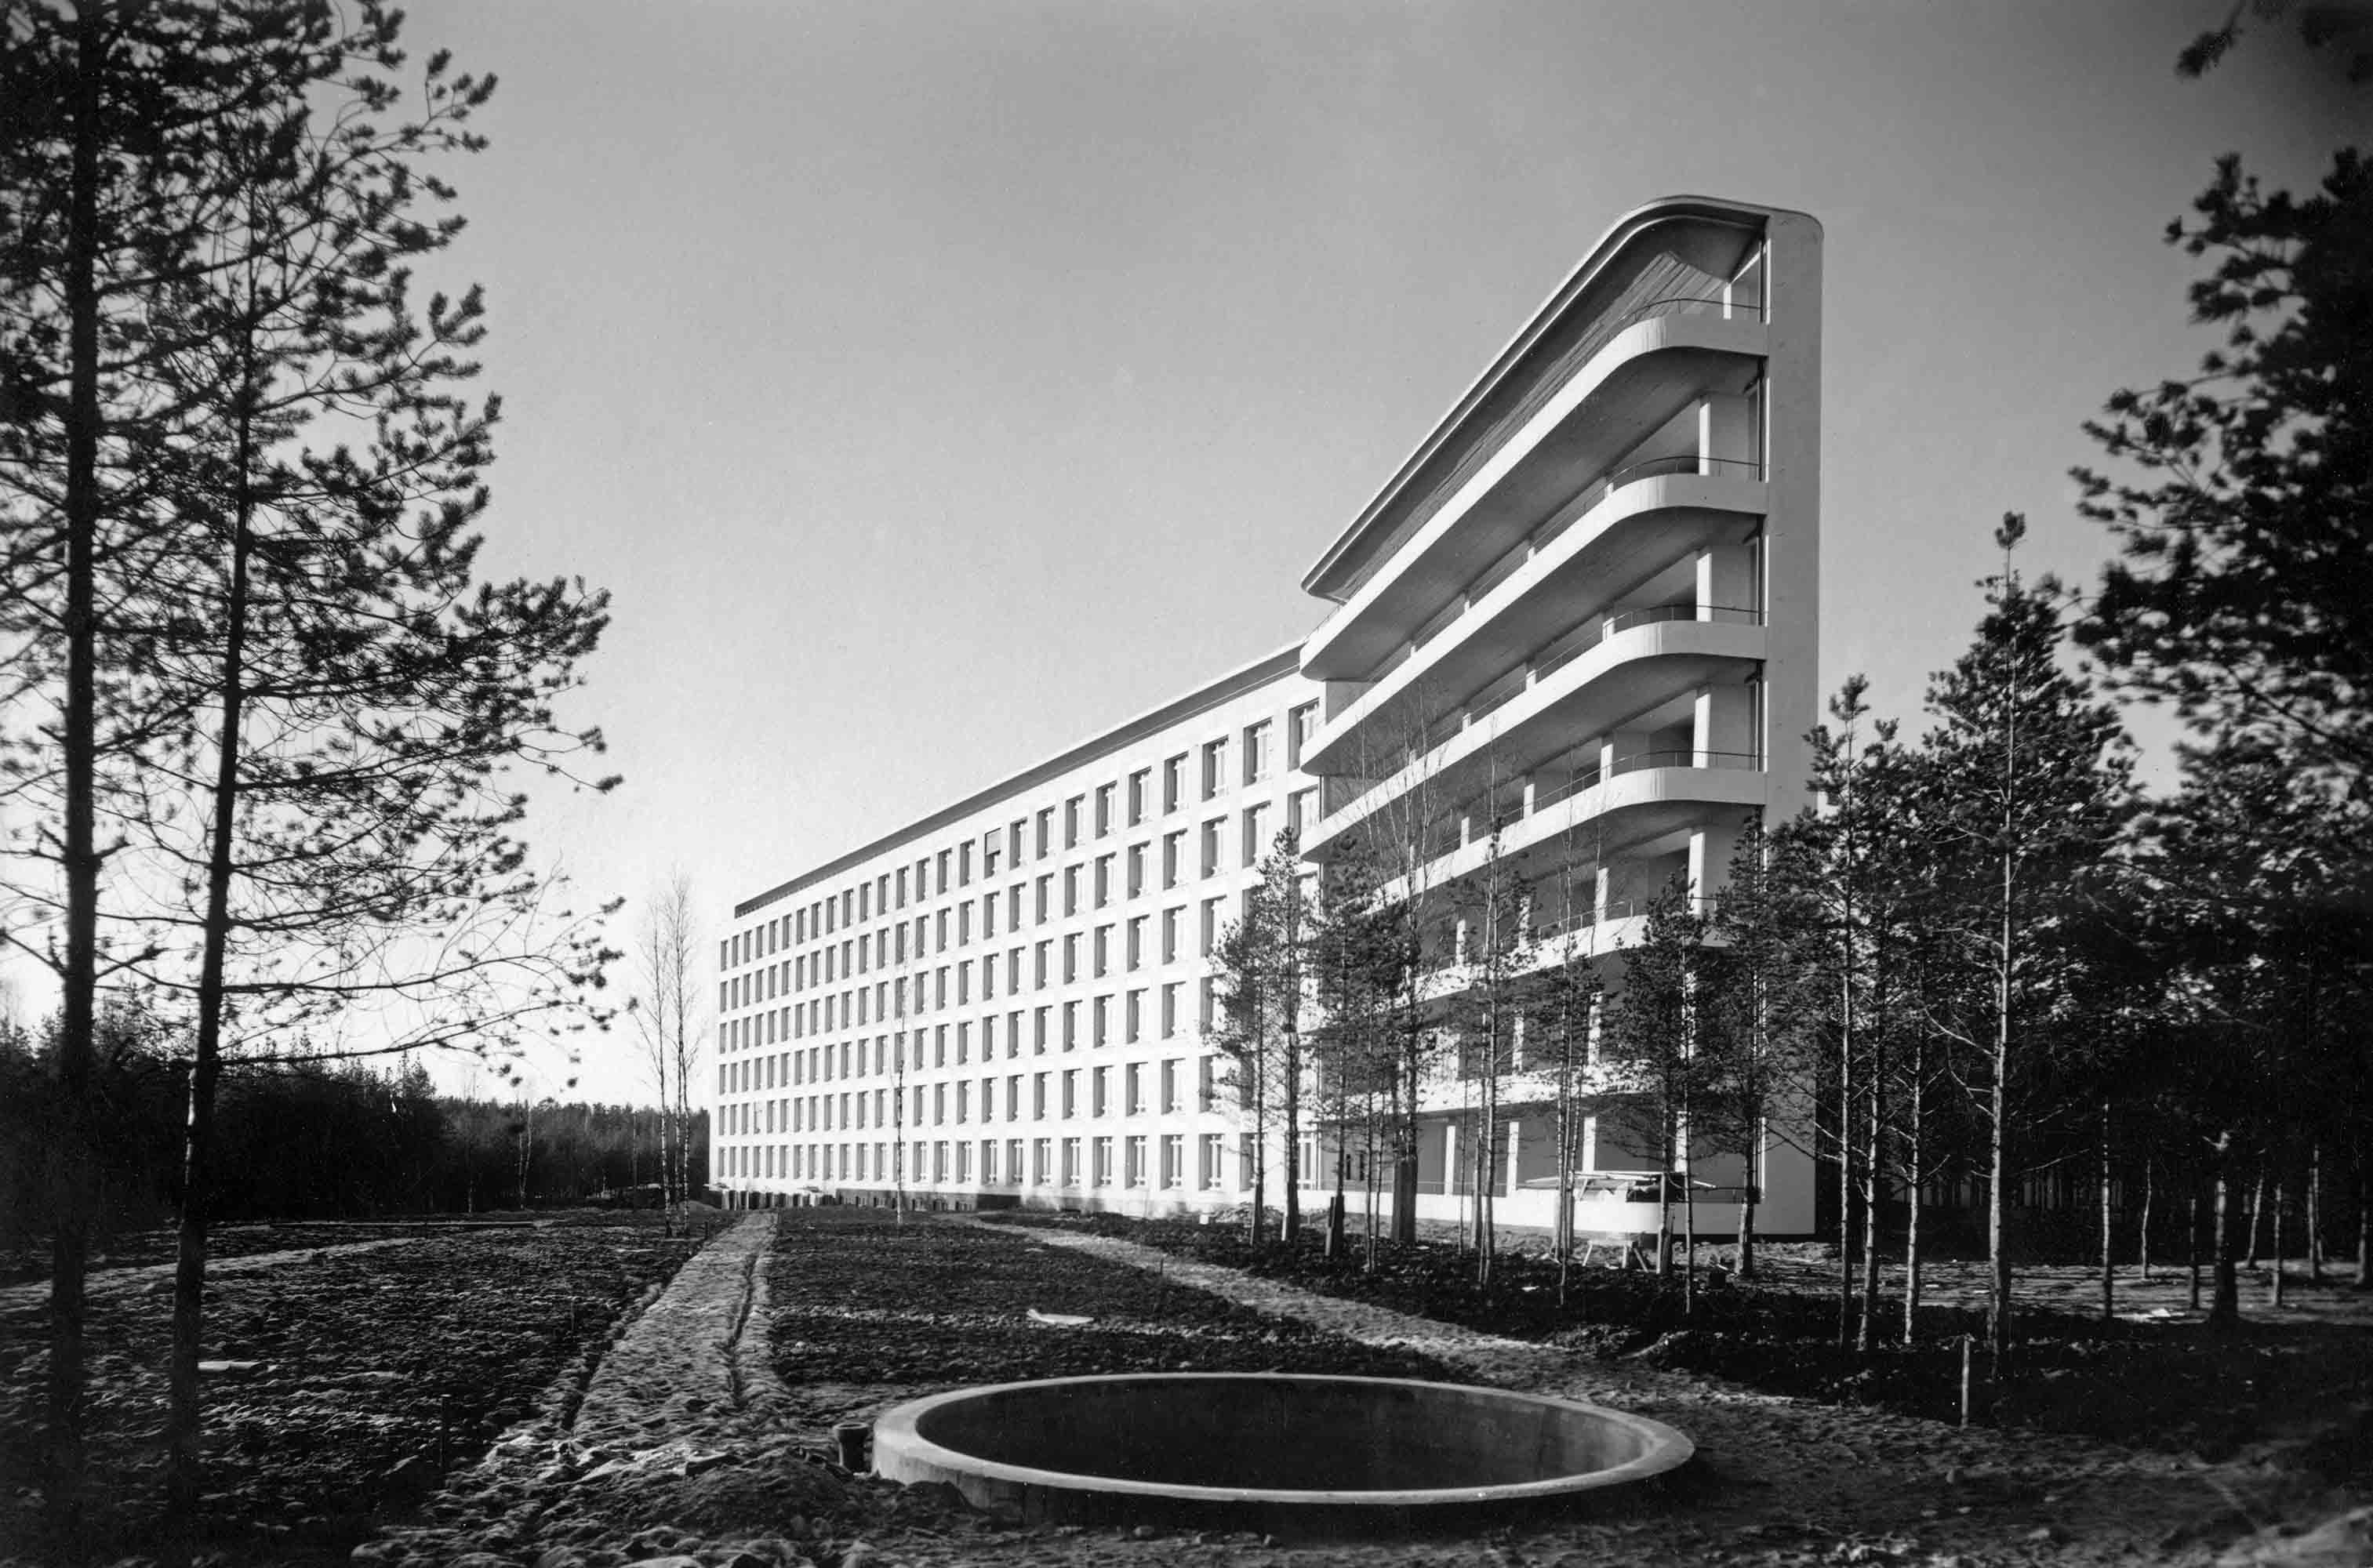 Sanatorium pour tuberculeux ©Alvar Aalto Museum, photo Gustaf Welin